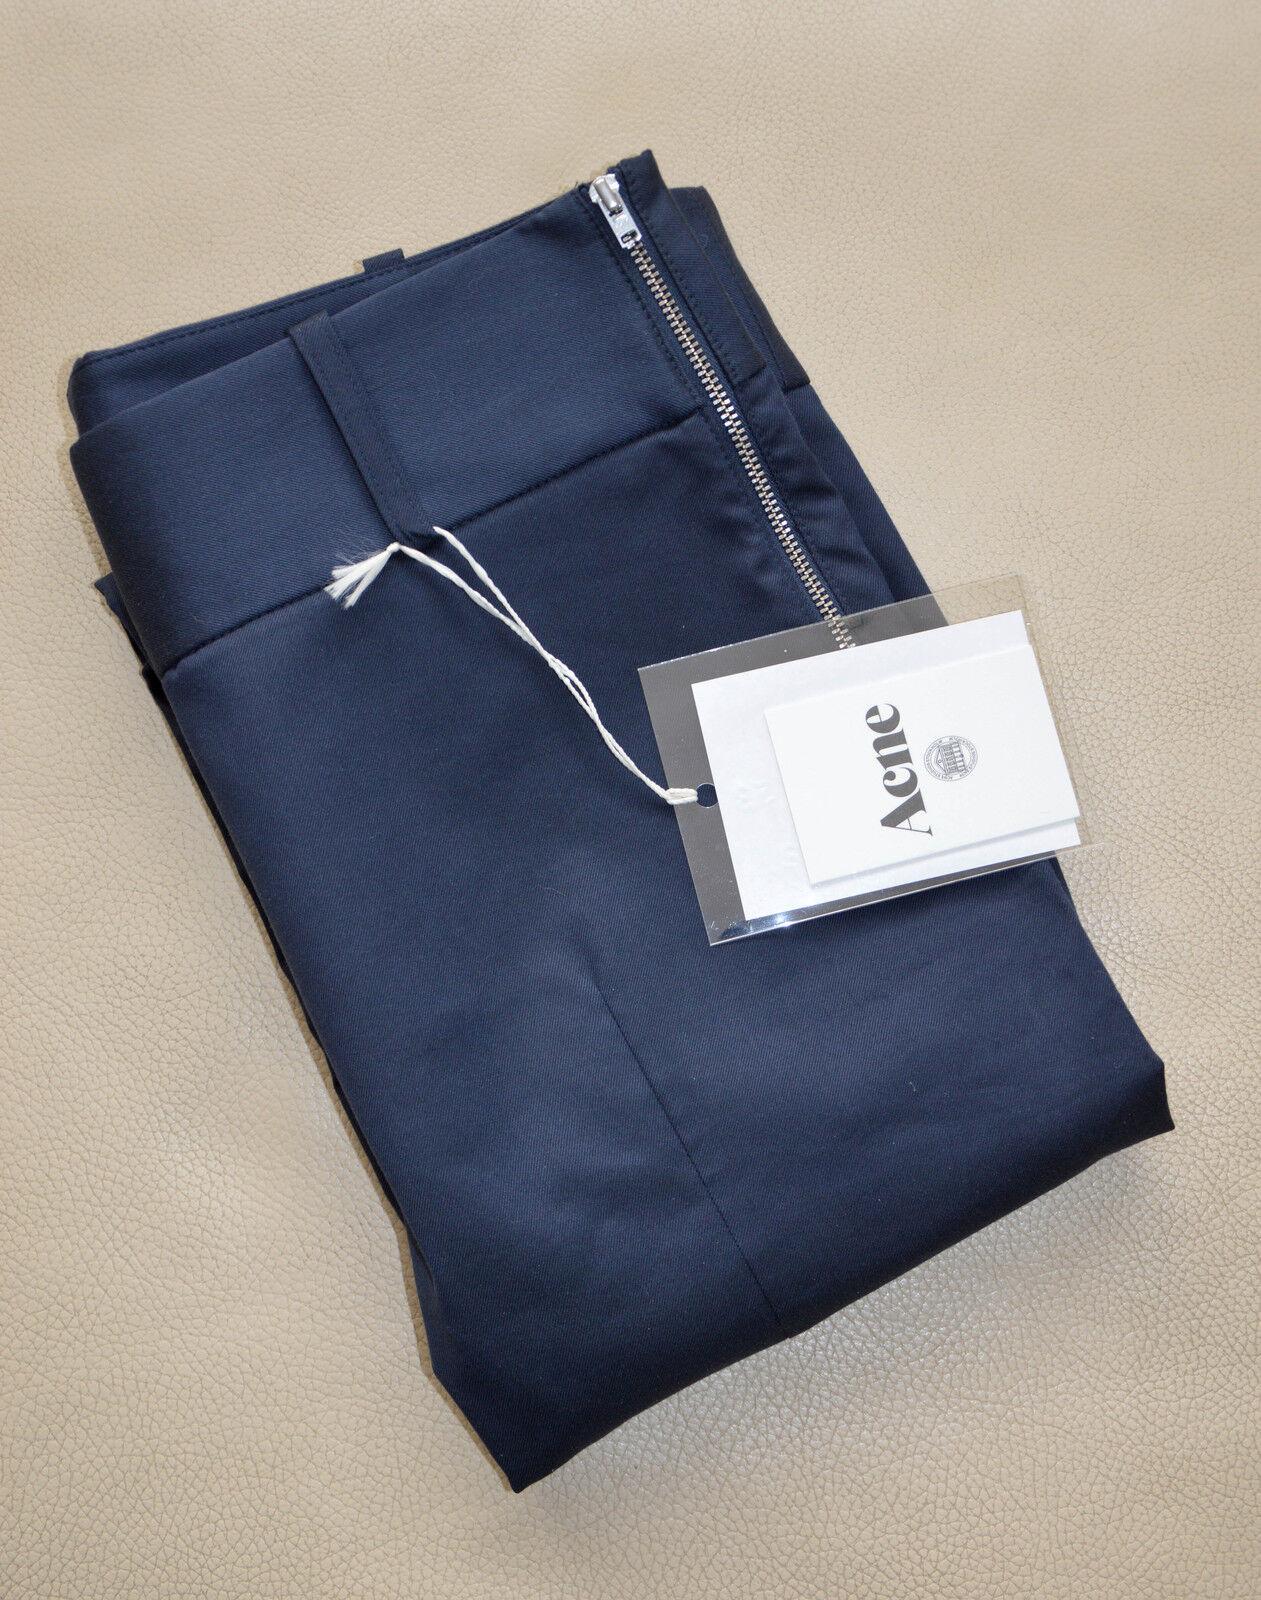 ACNE Best Low Dark bluee Straight Pants NWT, size 36